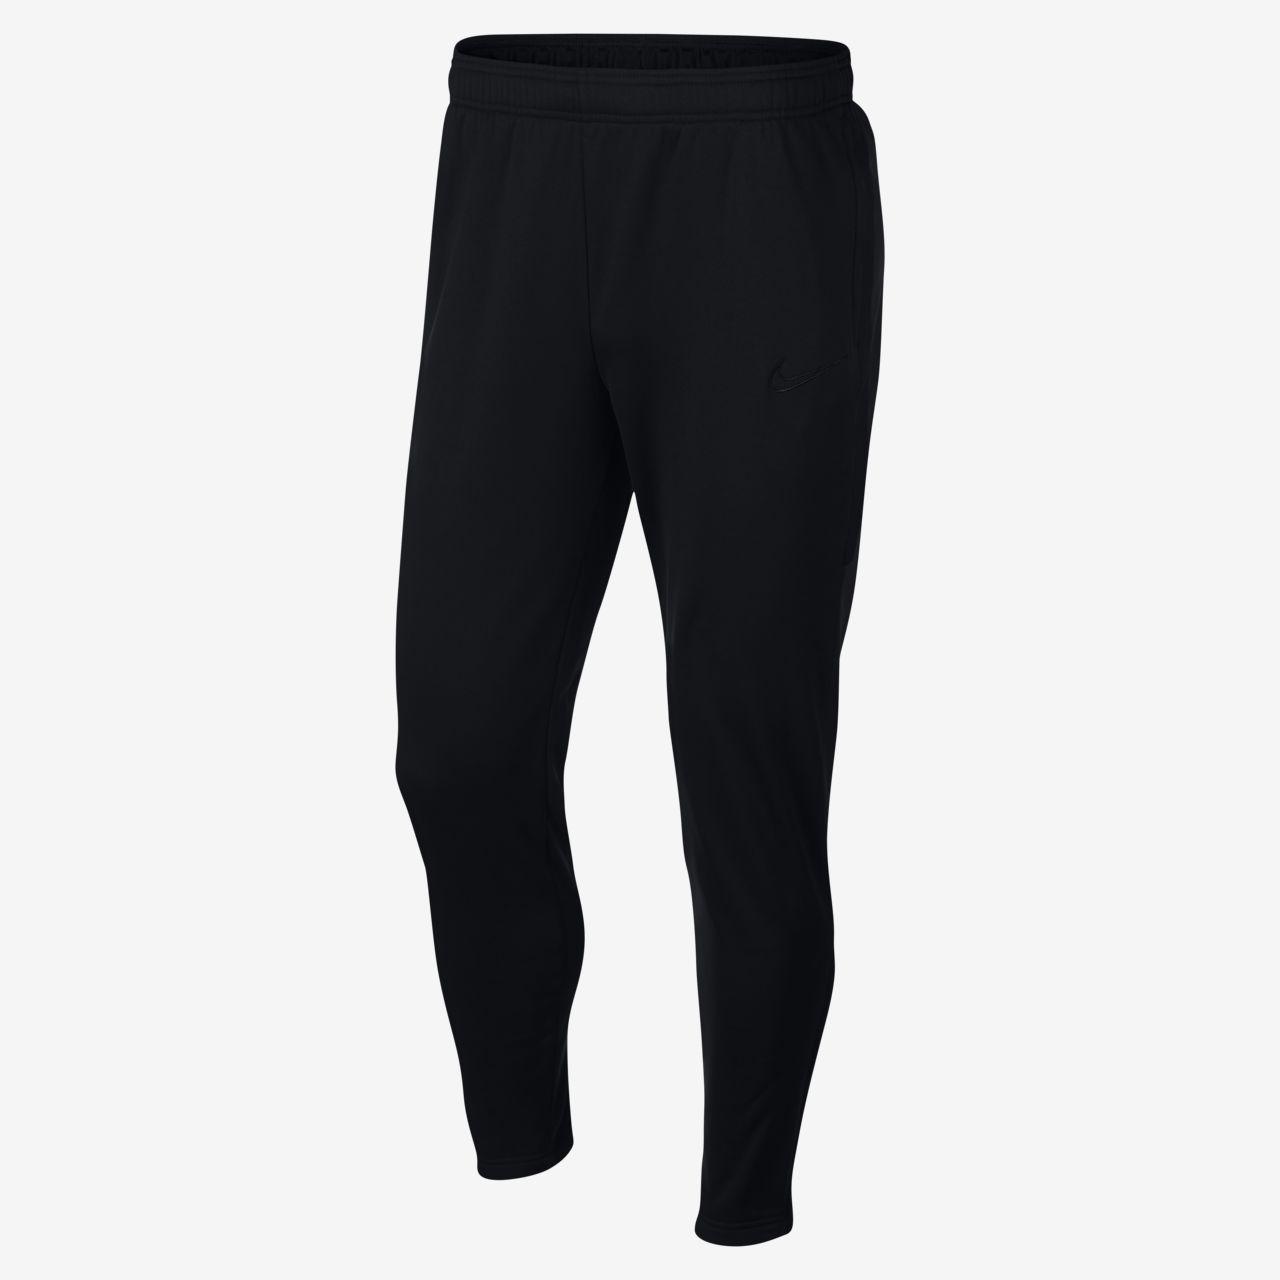 8be153ab949a6 Pour Homme Pantalon Football De Be Academy Therma Nike gvpqX